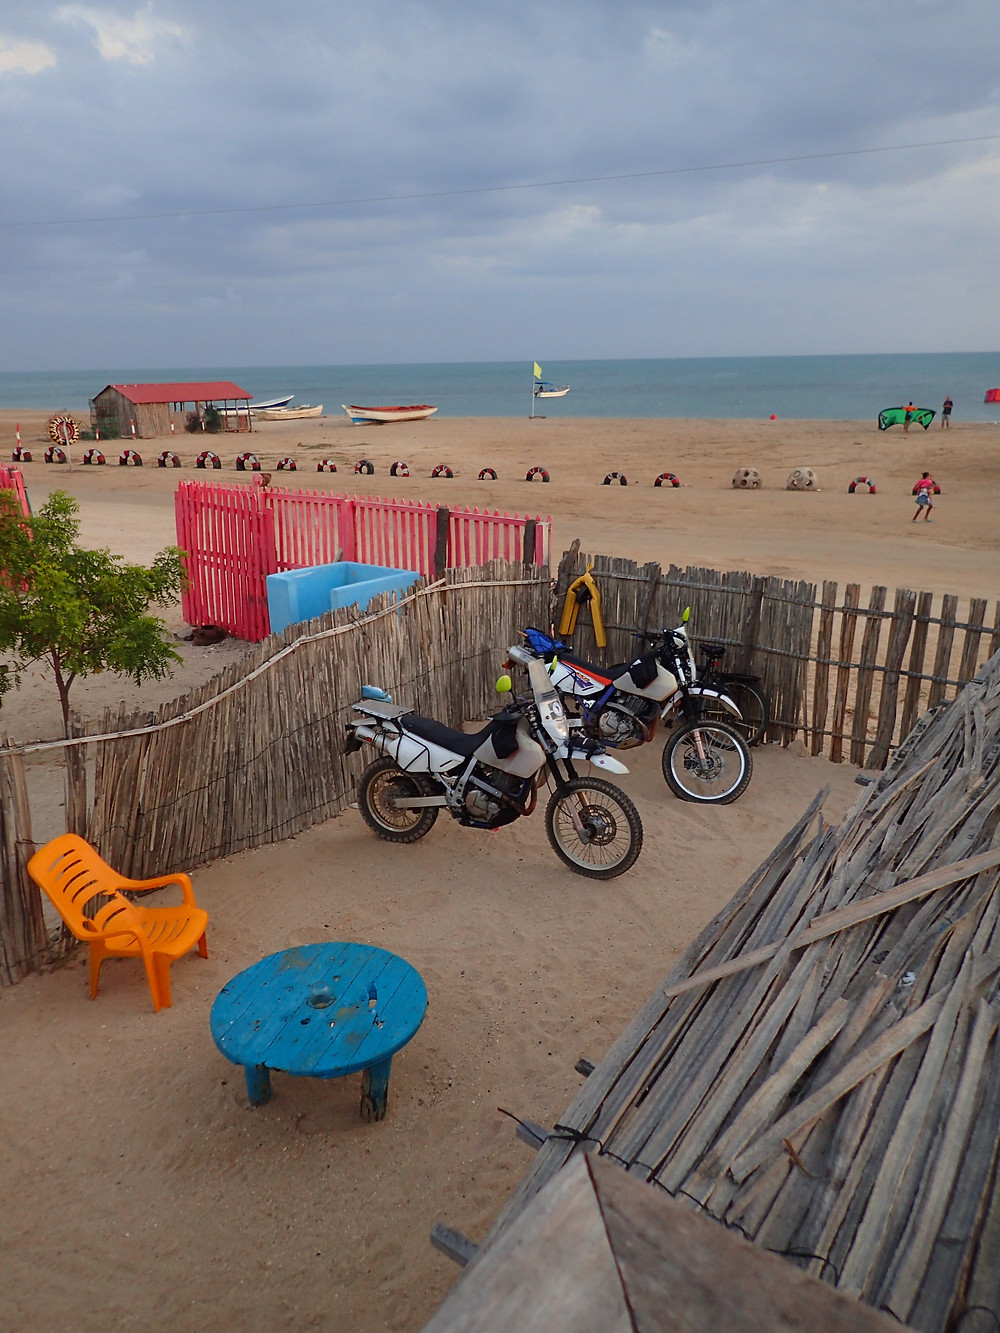 Bikes safe, beautiful surroundings, nice one!